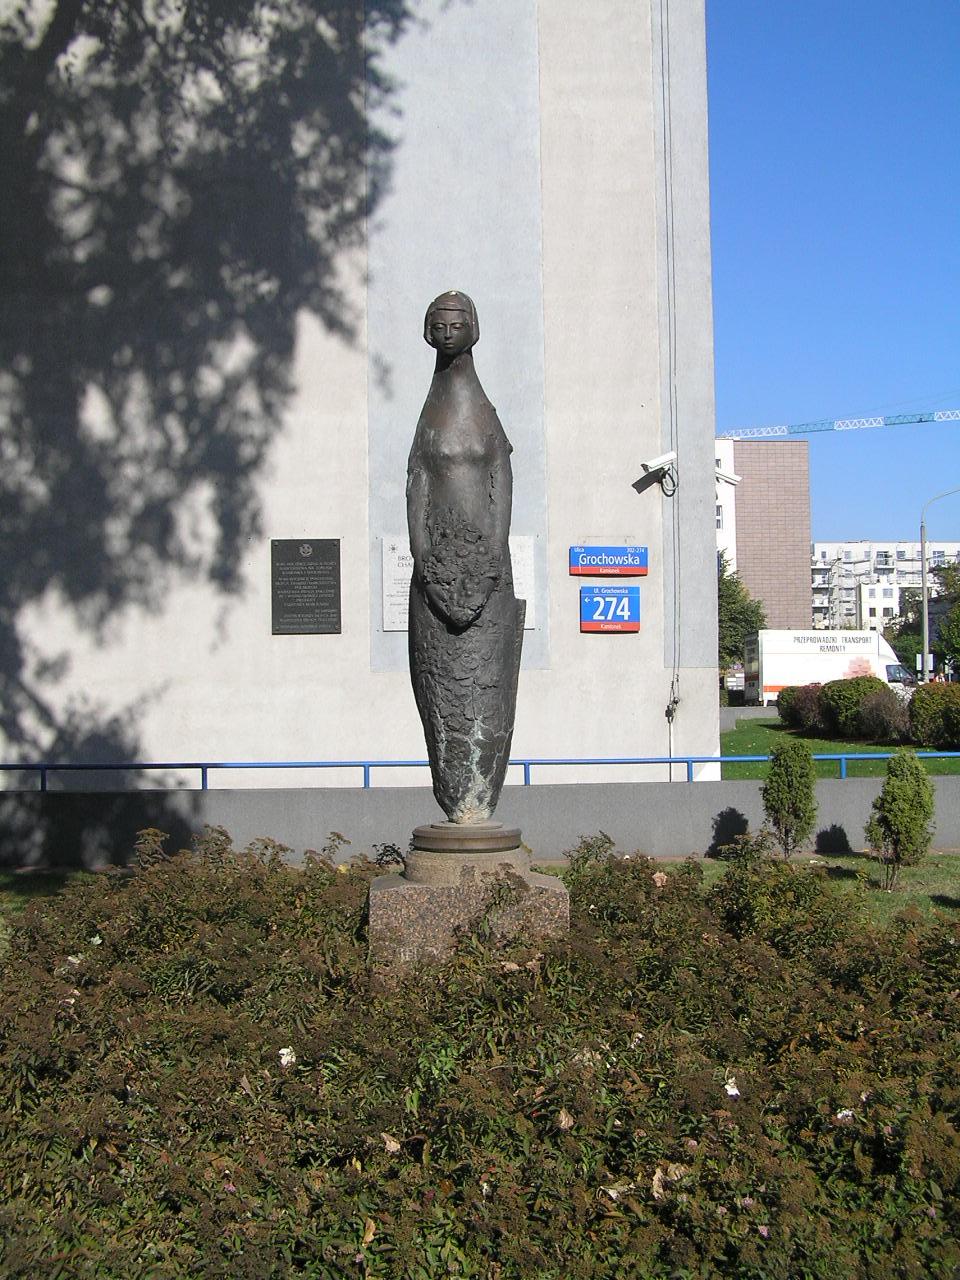 Rzeźba Syrenki - Grochowska 274